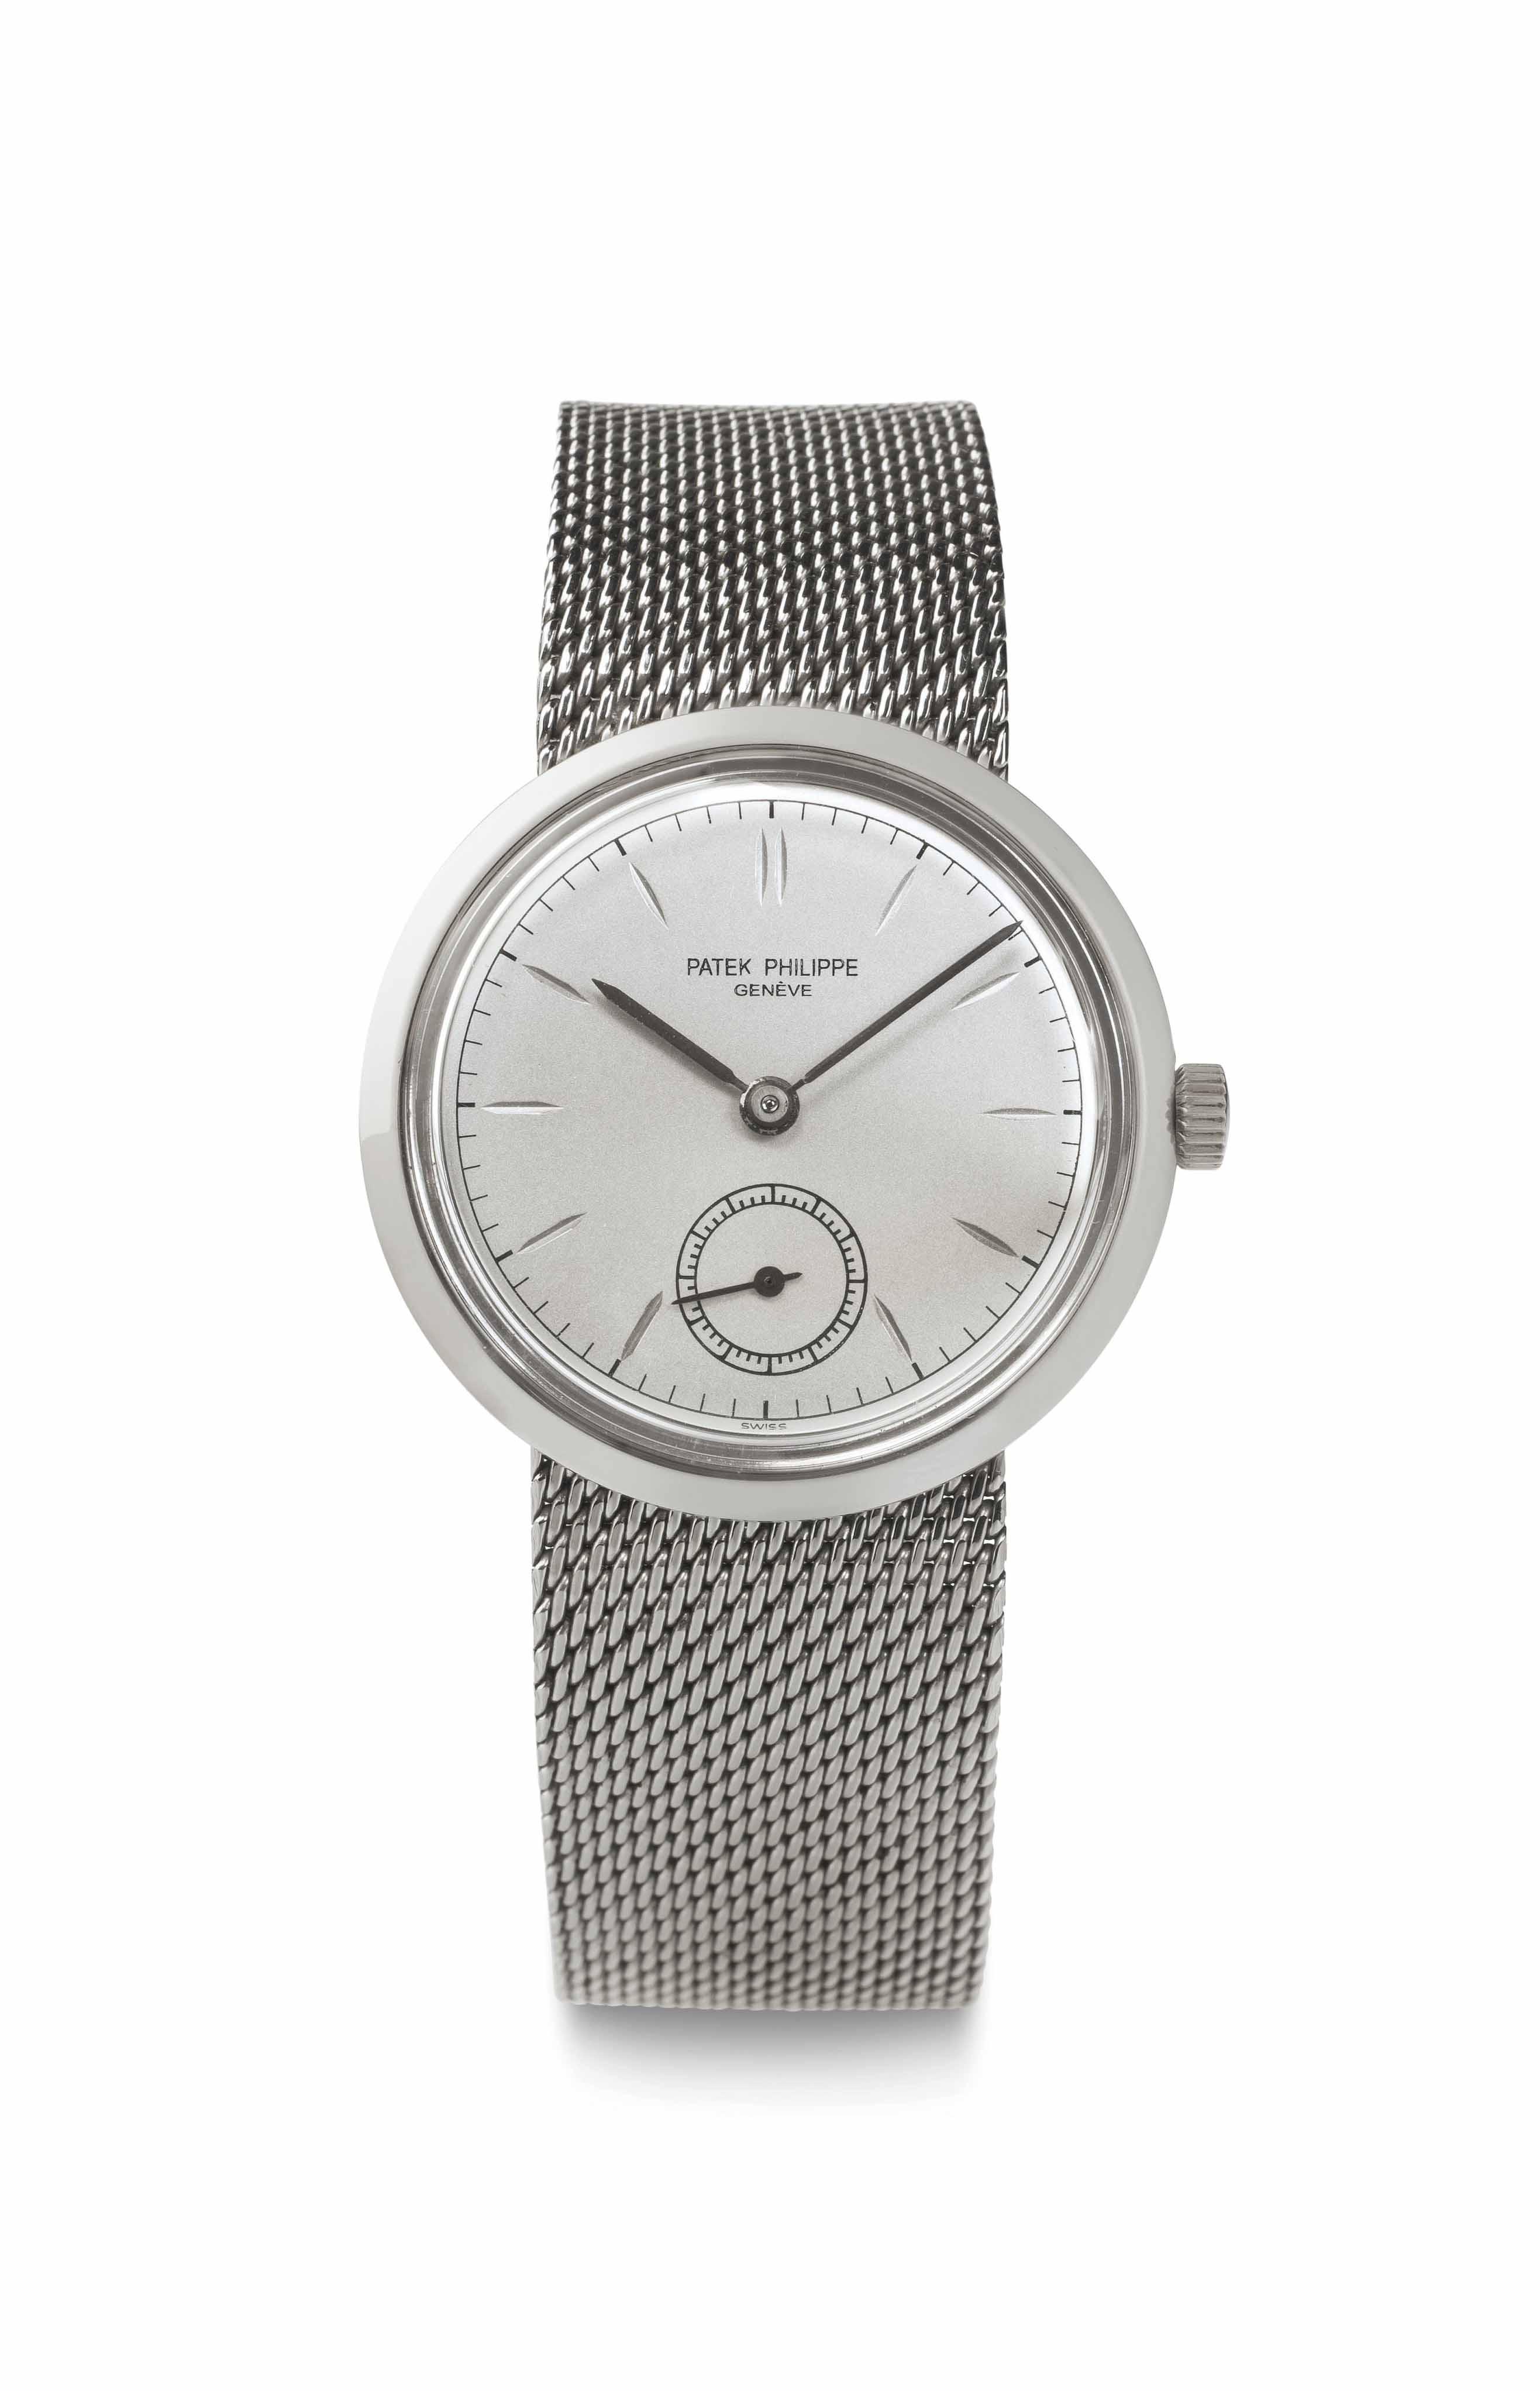 Patek philippe a stainless steel wristwatch signed patek philippe geneve ref 3418 for Patek philippe geneve